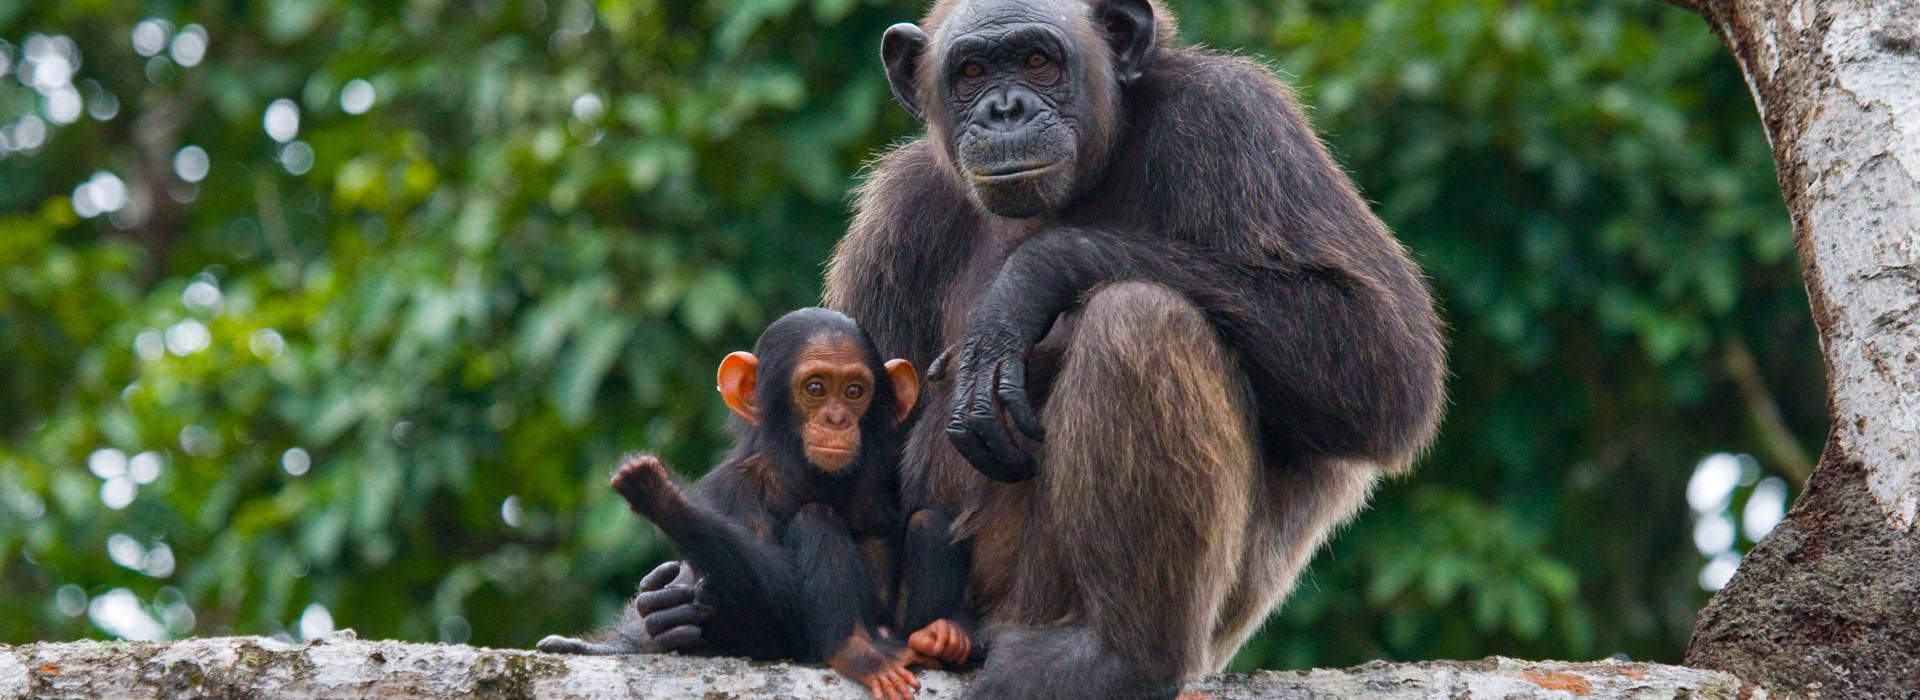 6 Days Queen Elizabeth & Bwindi Safari 2021 - African Adventure Specialists